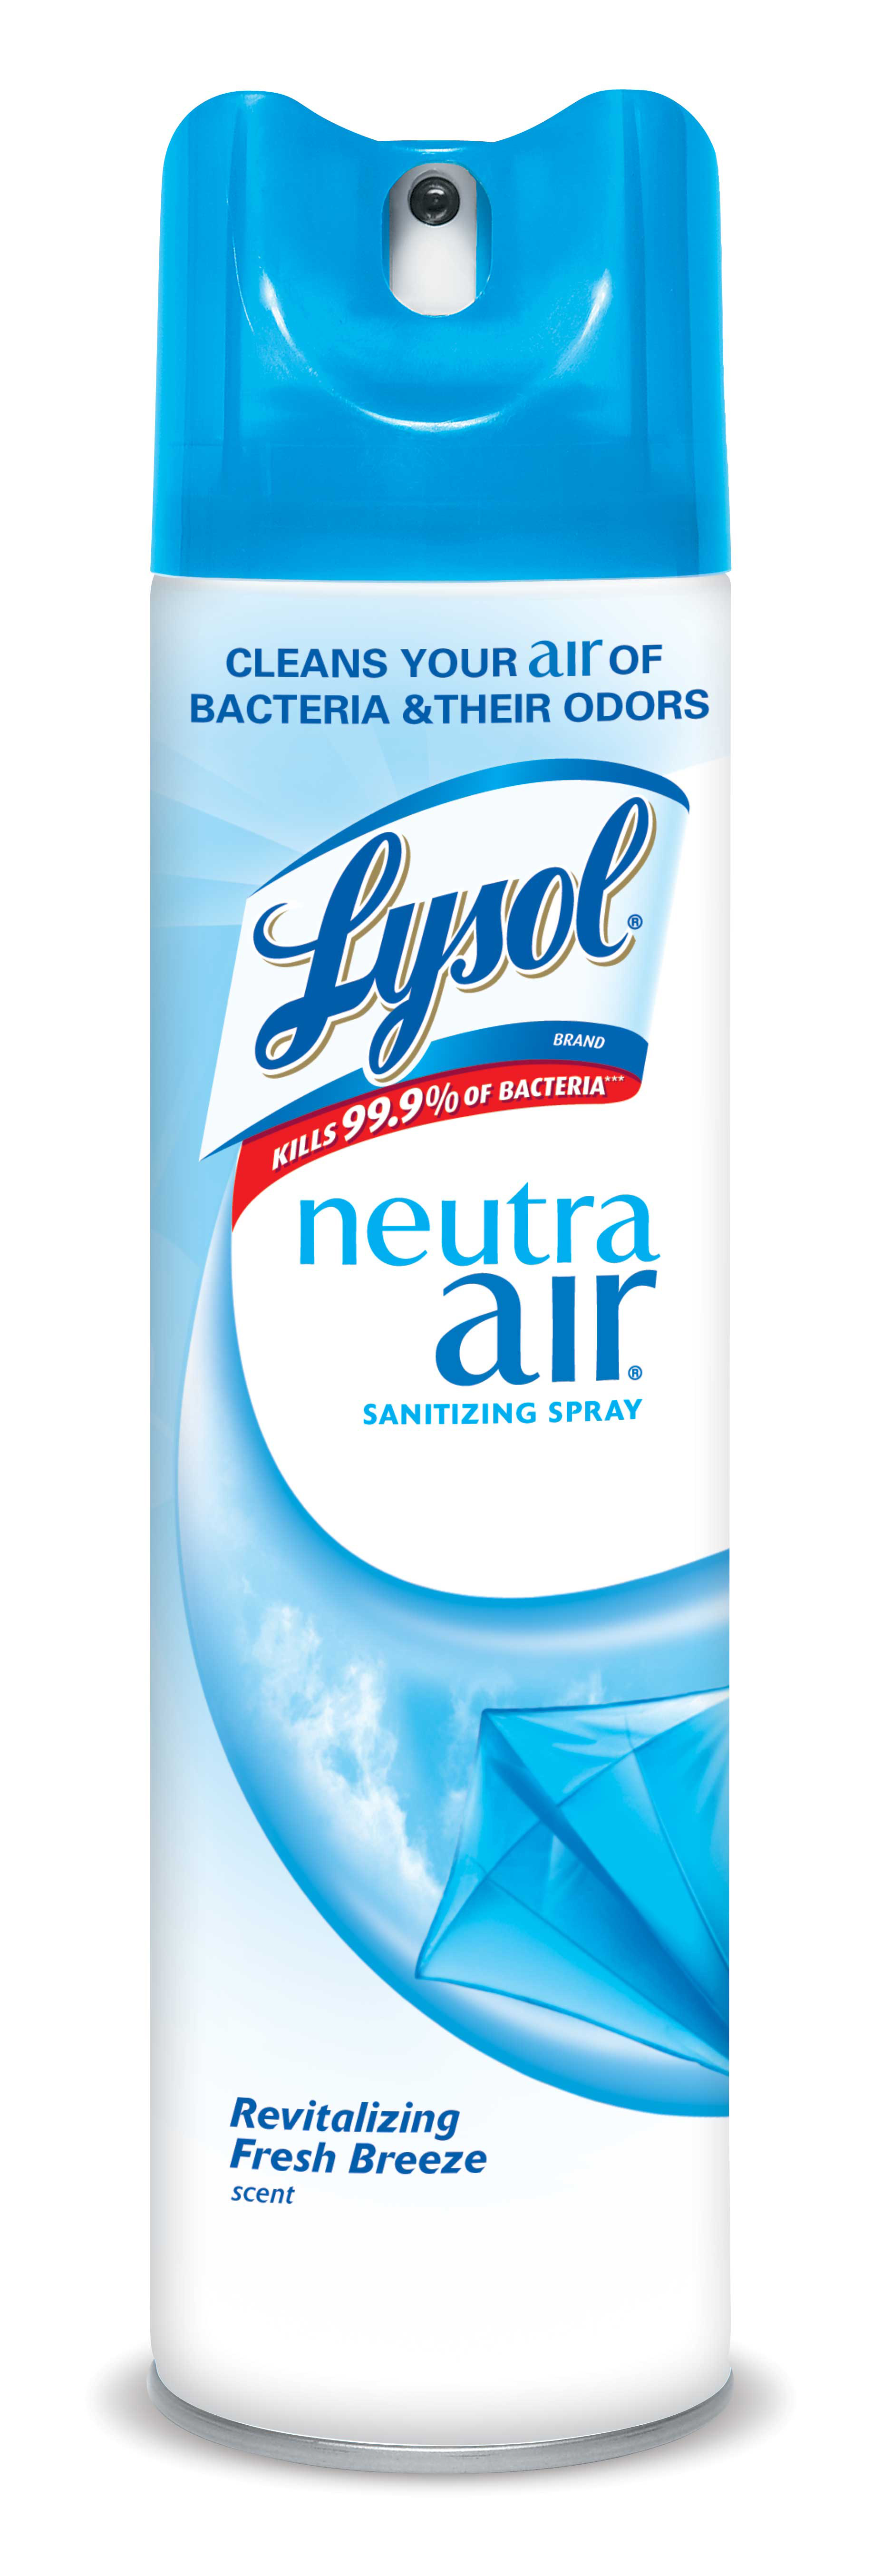 Lysol Neutra Air Sanitizing Spray, Fresh Breeze, 10oz, Air Freshener, Odor Neutralizer